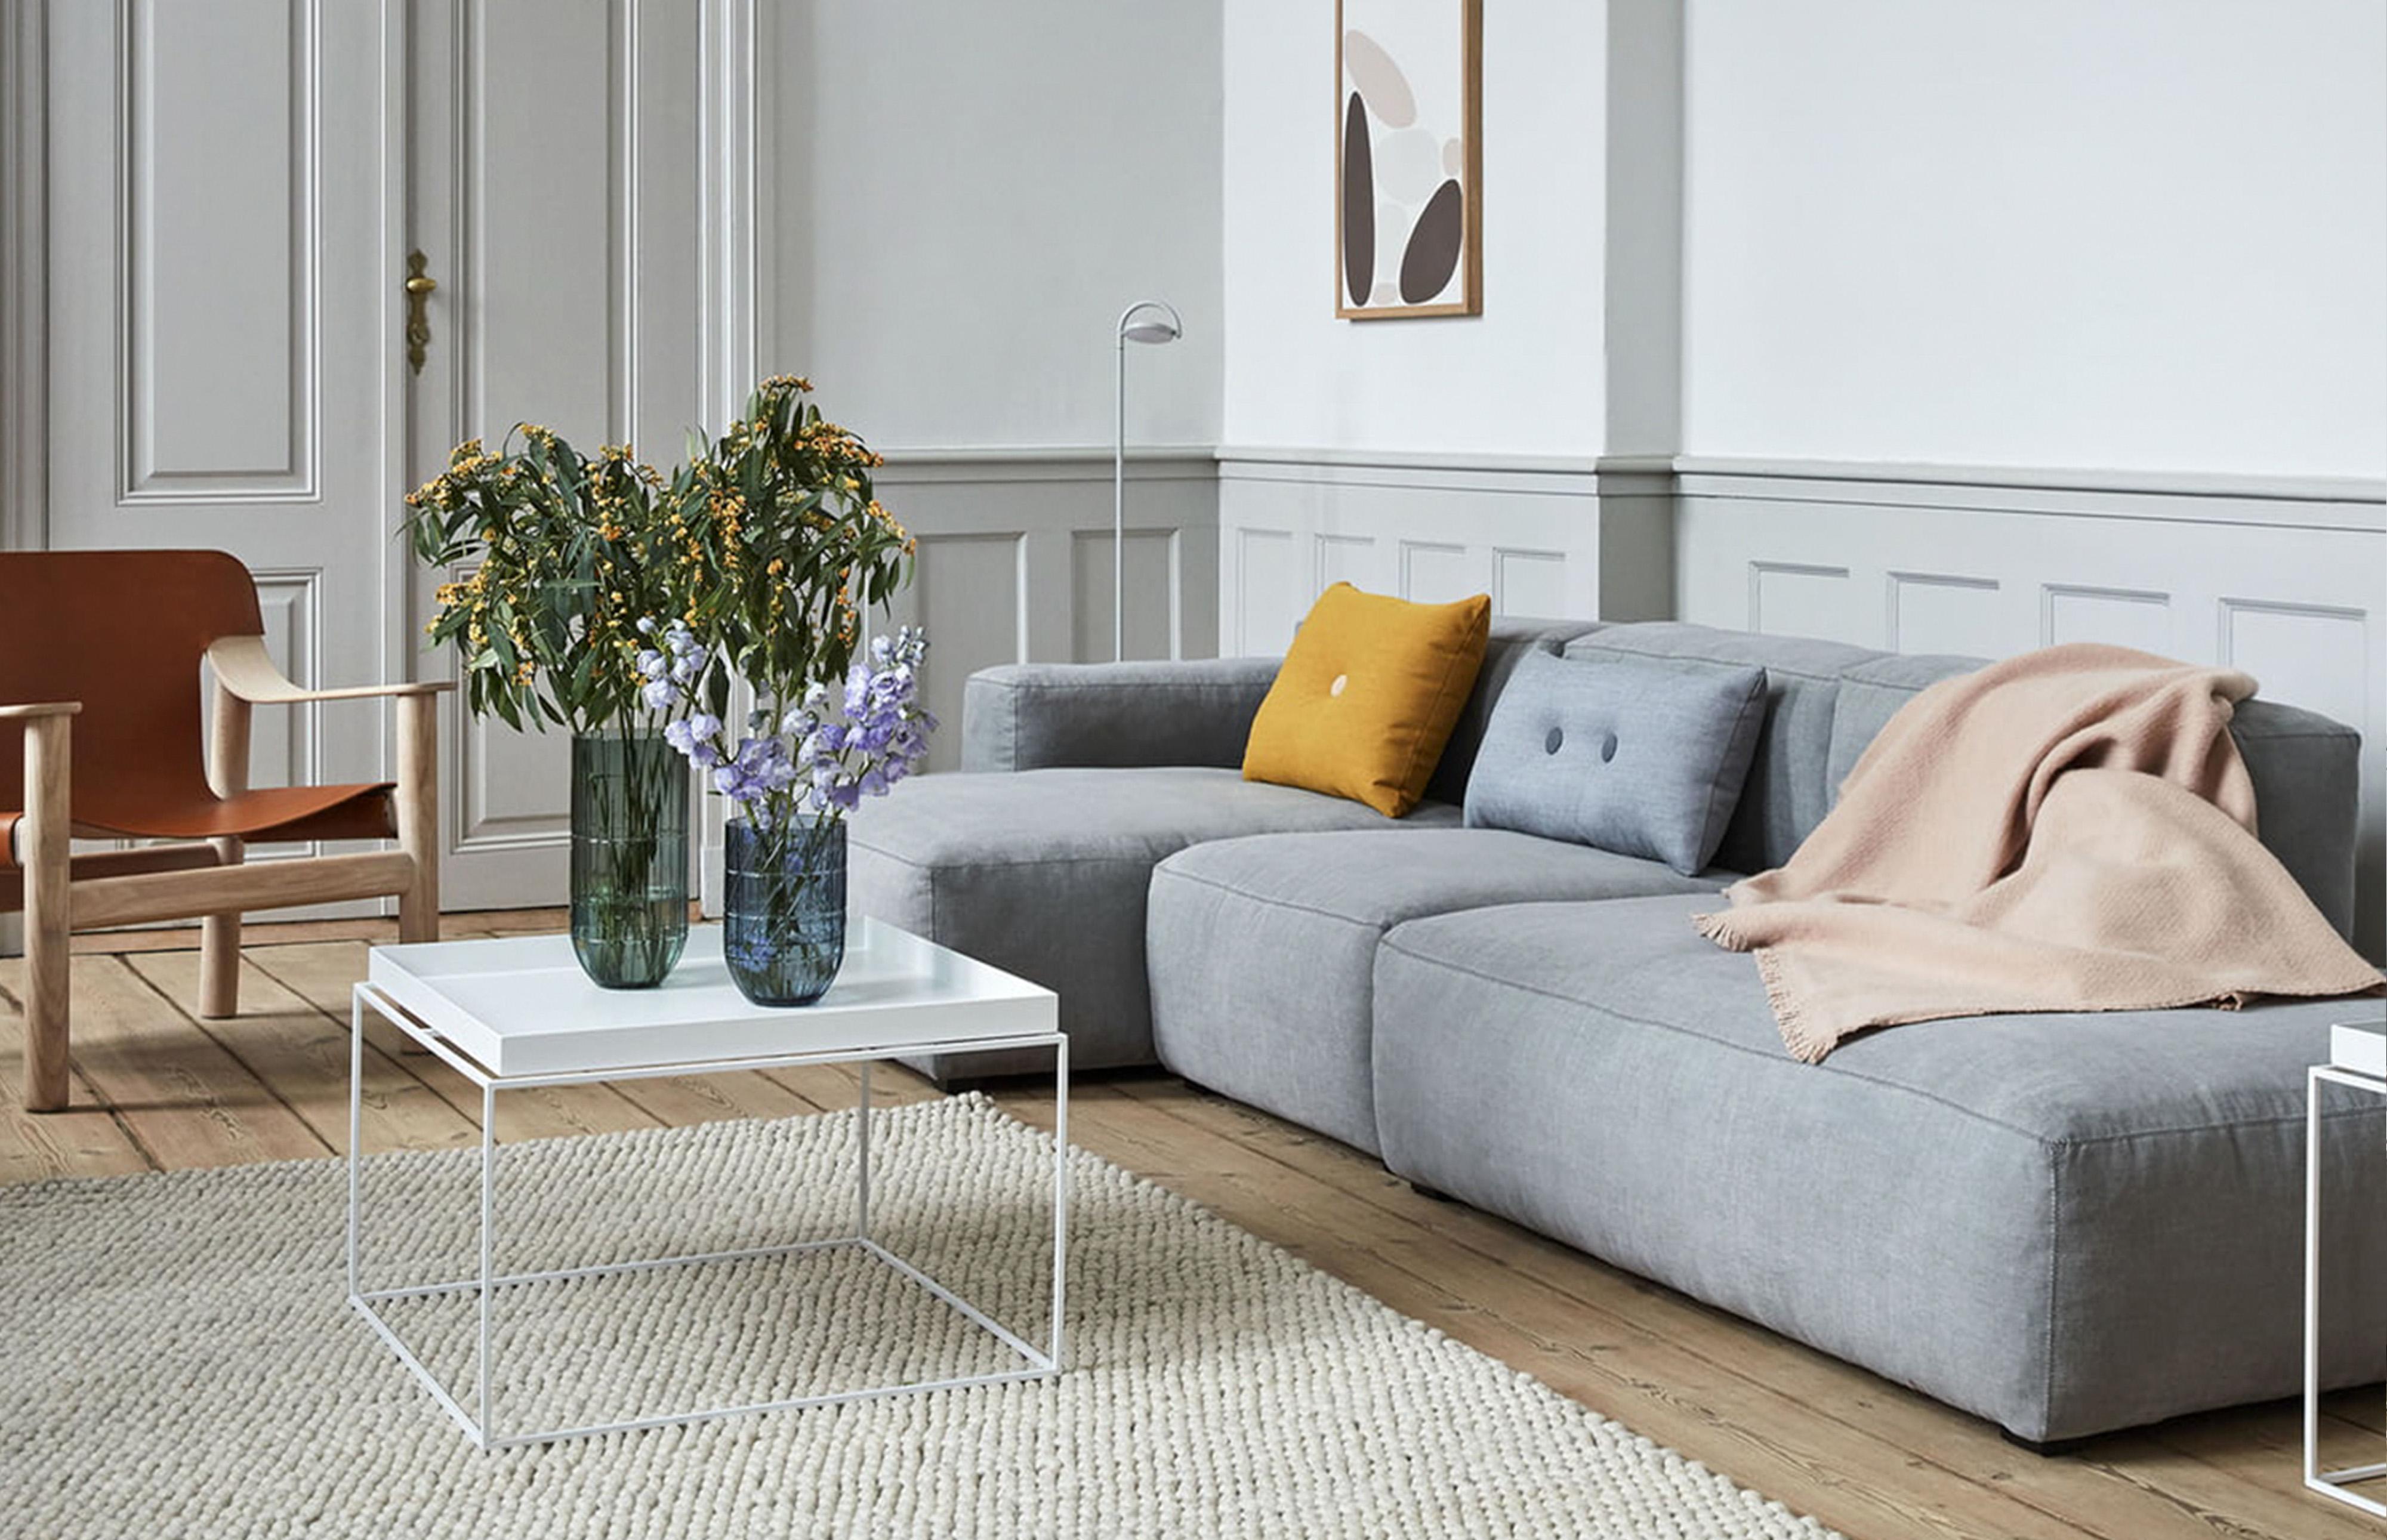 mags-sofa-combo-4-journal